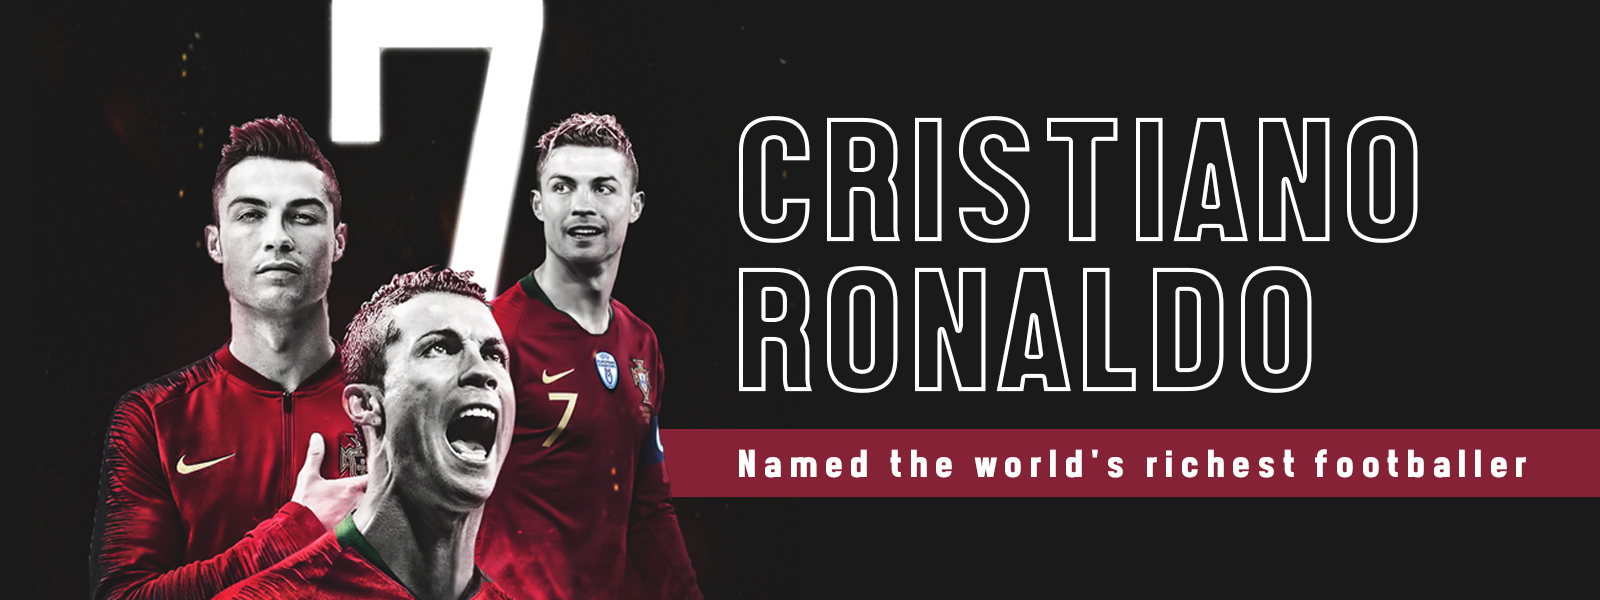 Cristiano Ronaldo Named The World's Richest Footballer